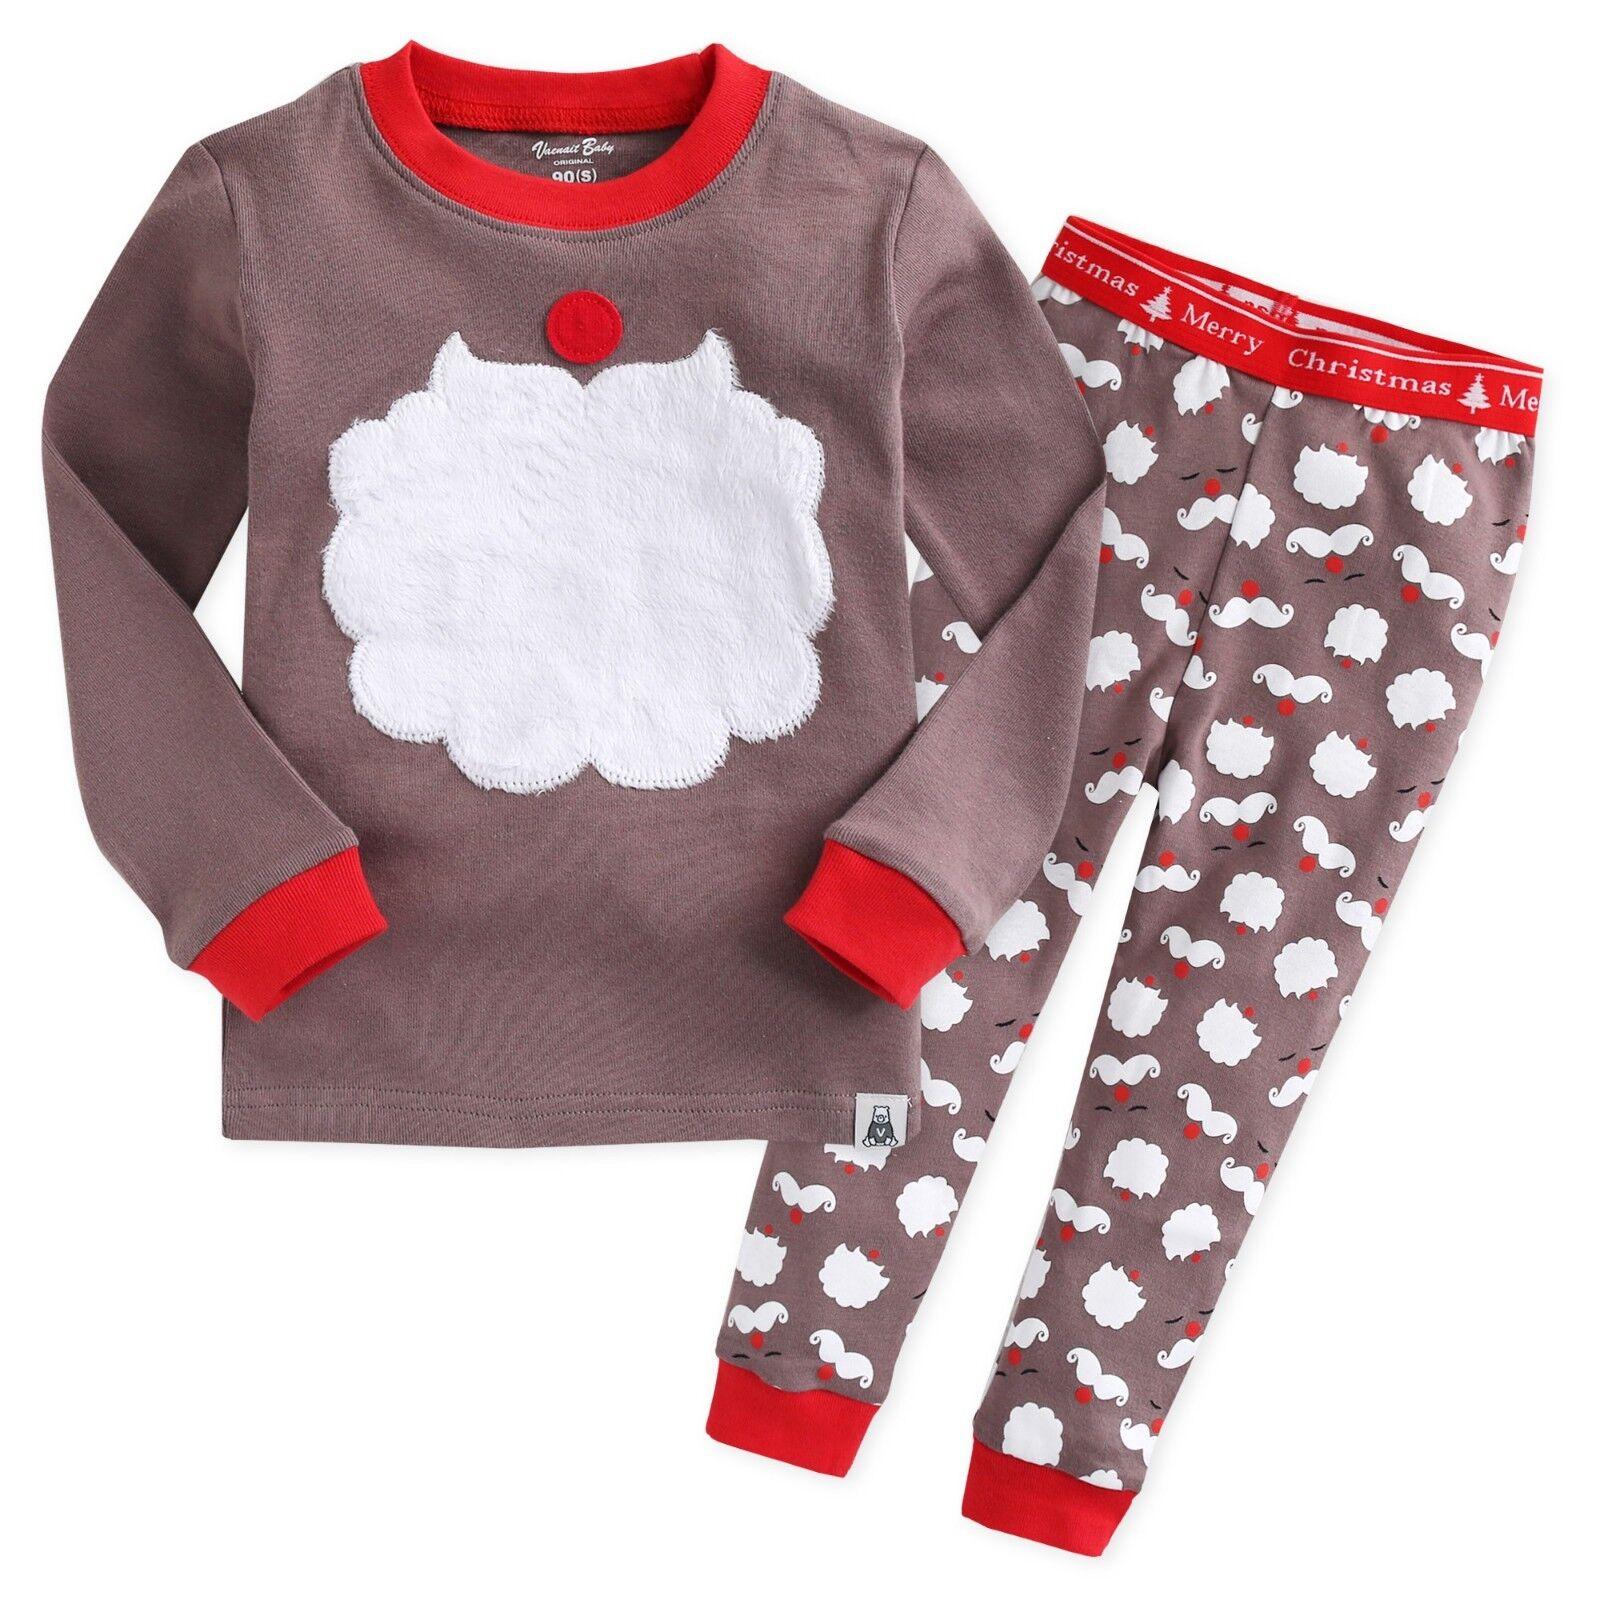 kids cloth santas village - HD1600×1600